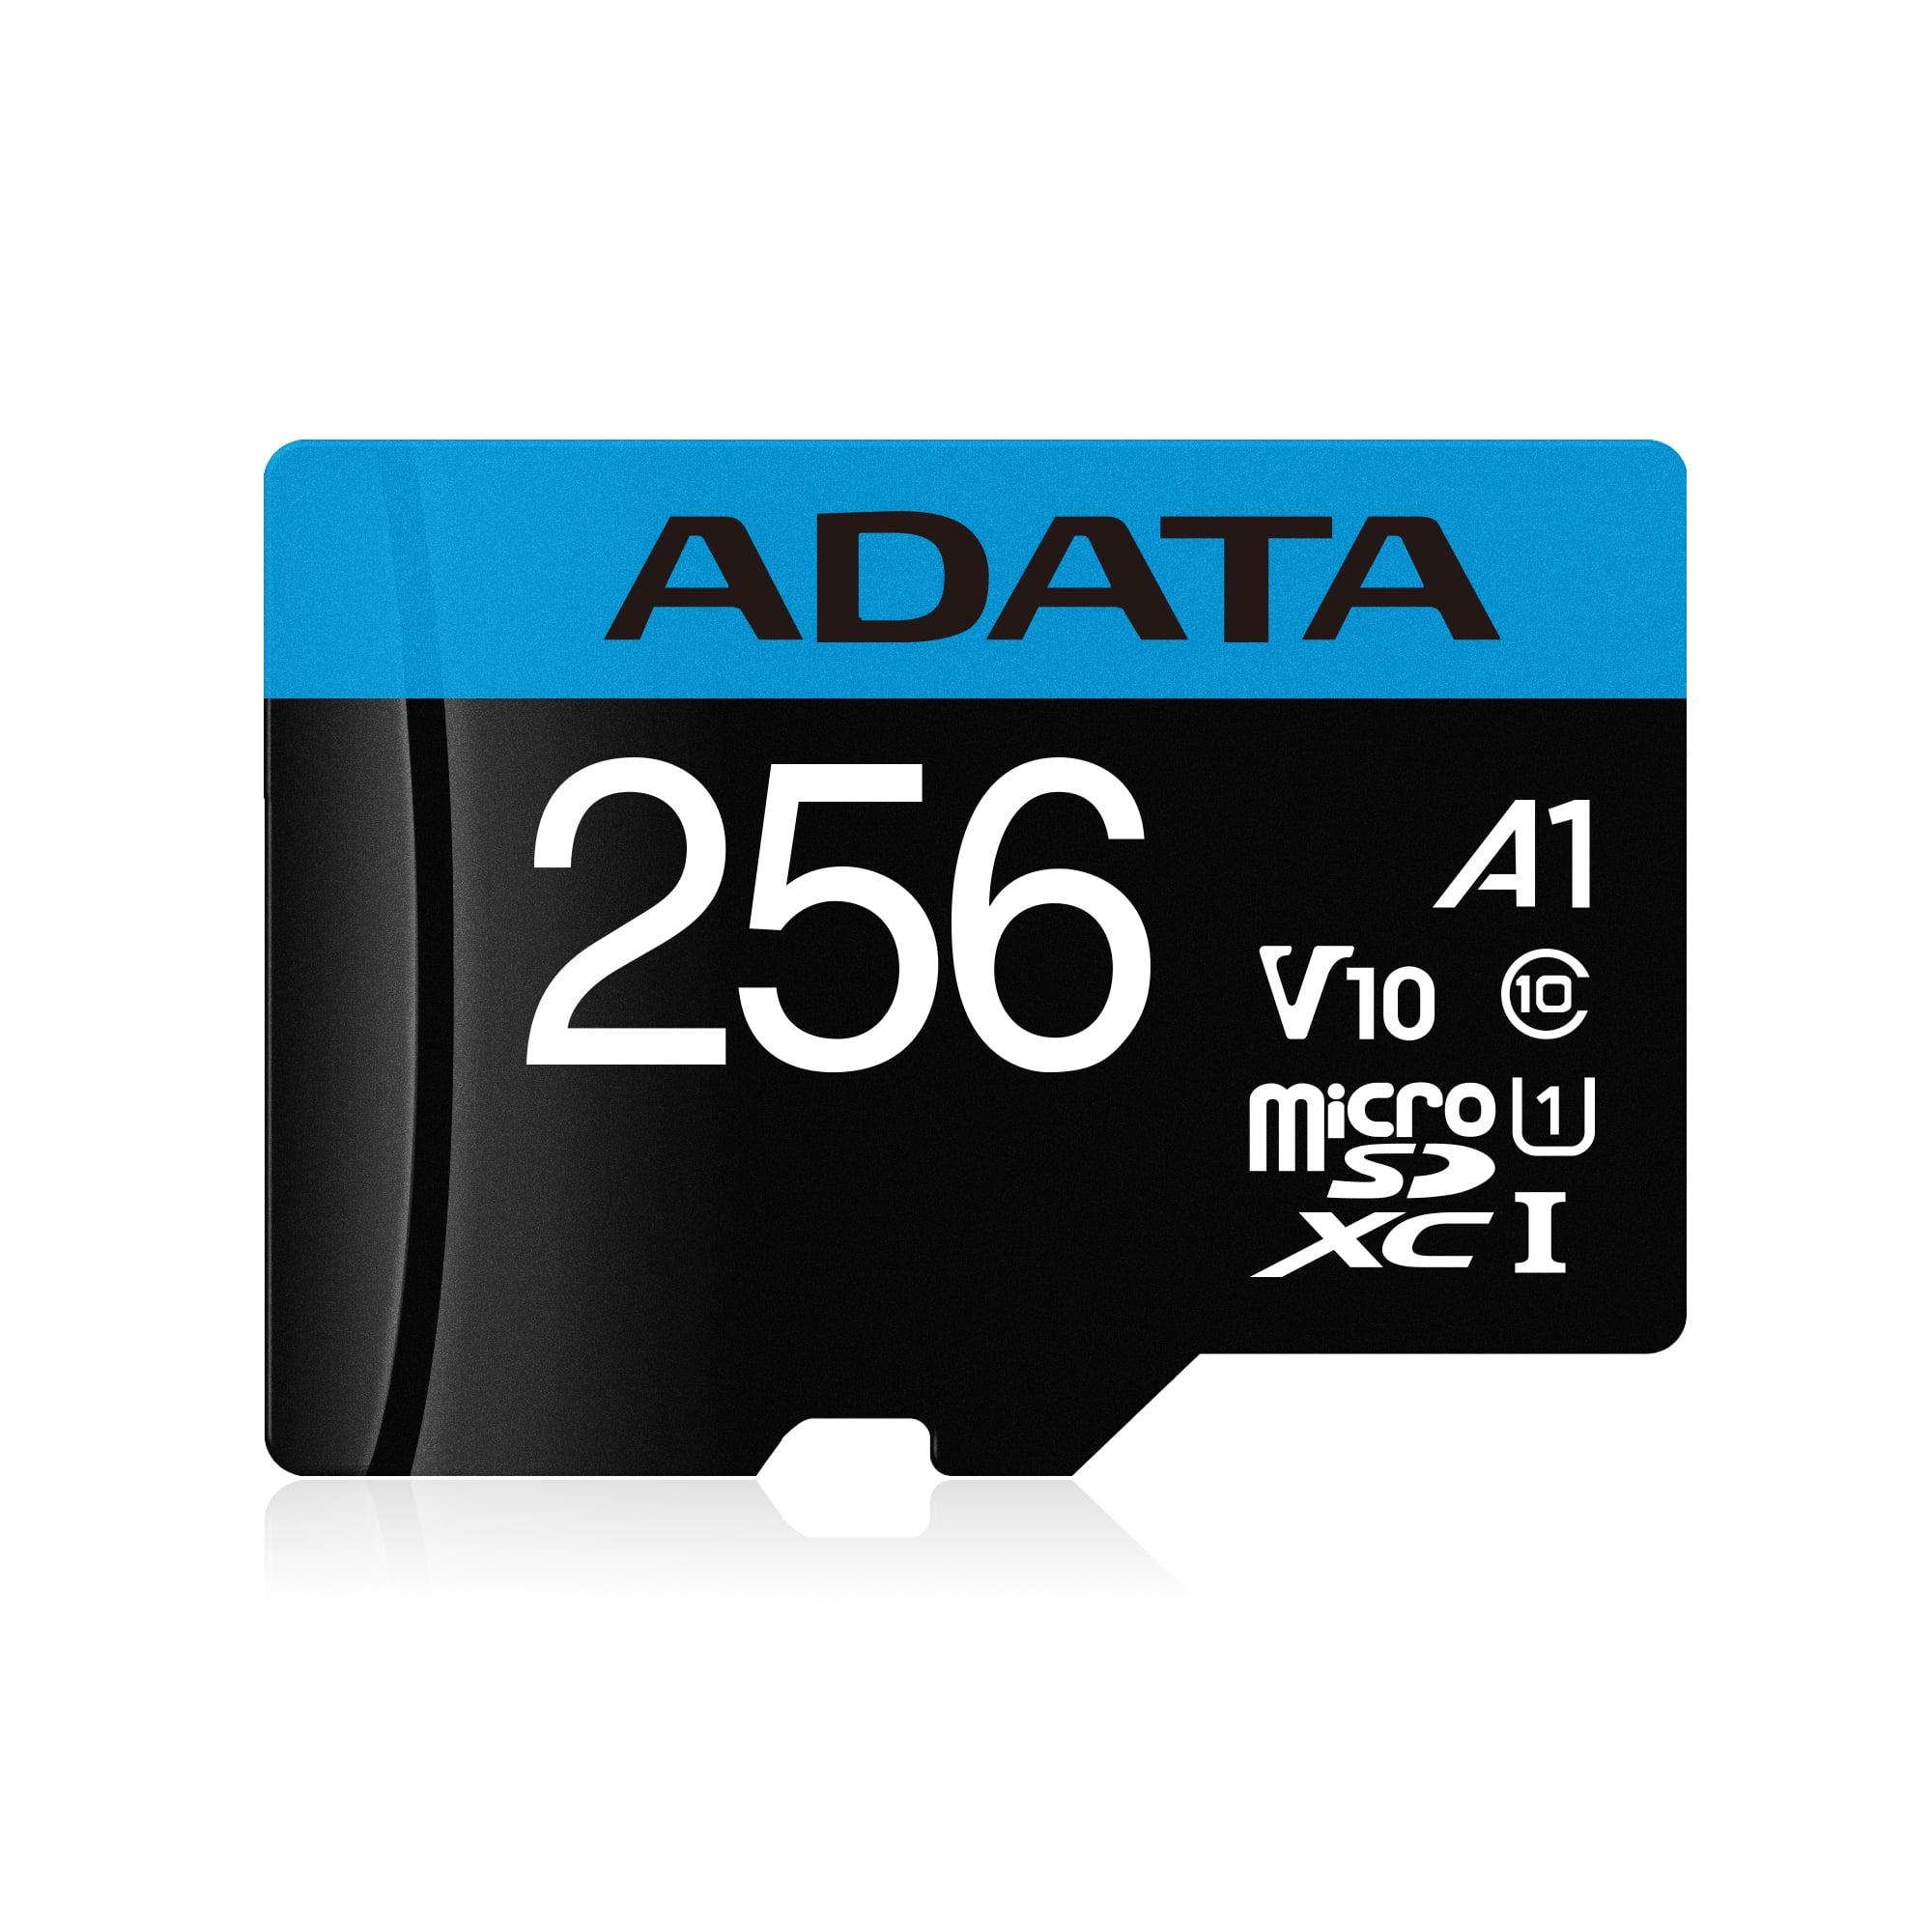 ADATA MicroSDXC 256GB UHS-I 100/25MB/s + adapter - AUSDX256GUICL10A1-RA1